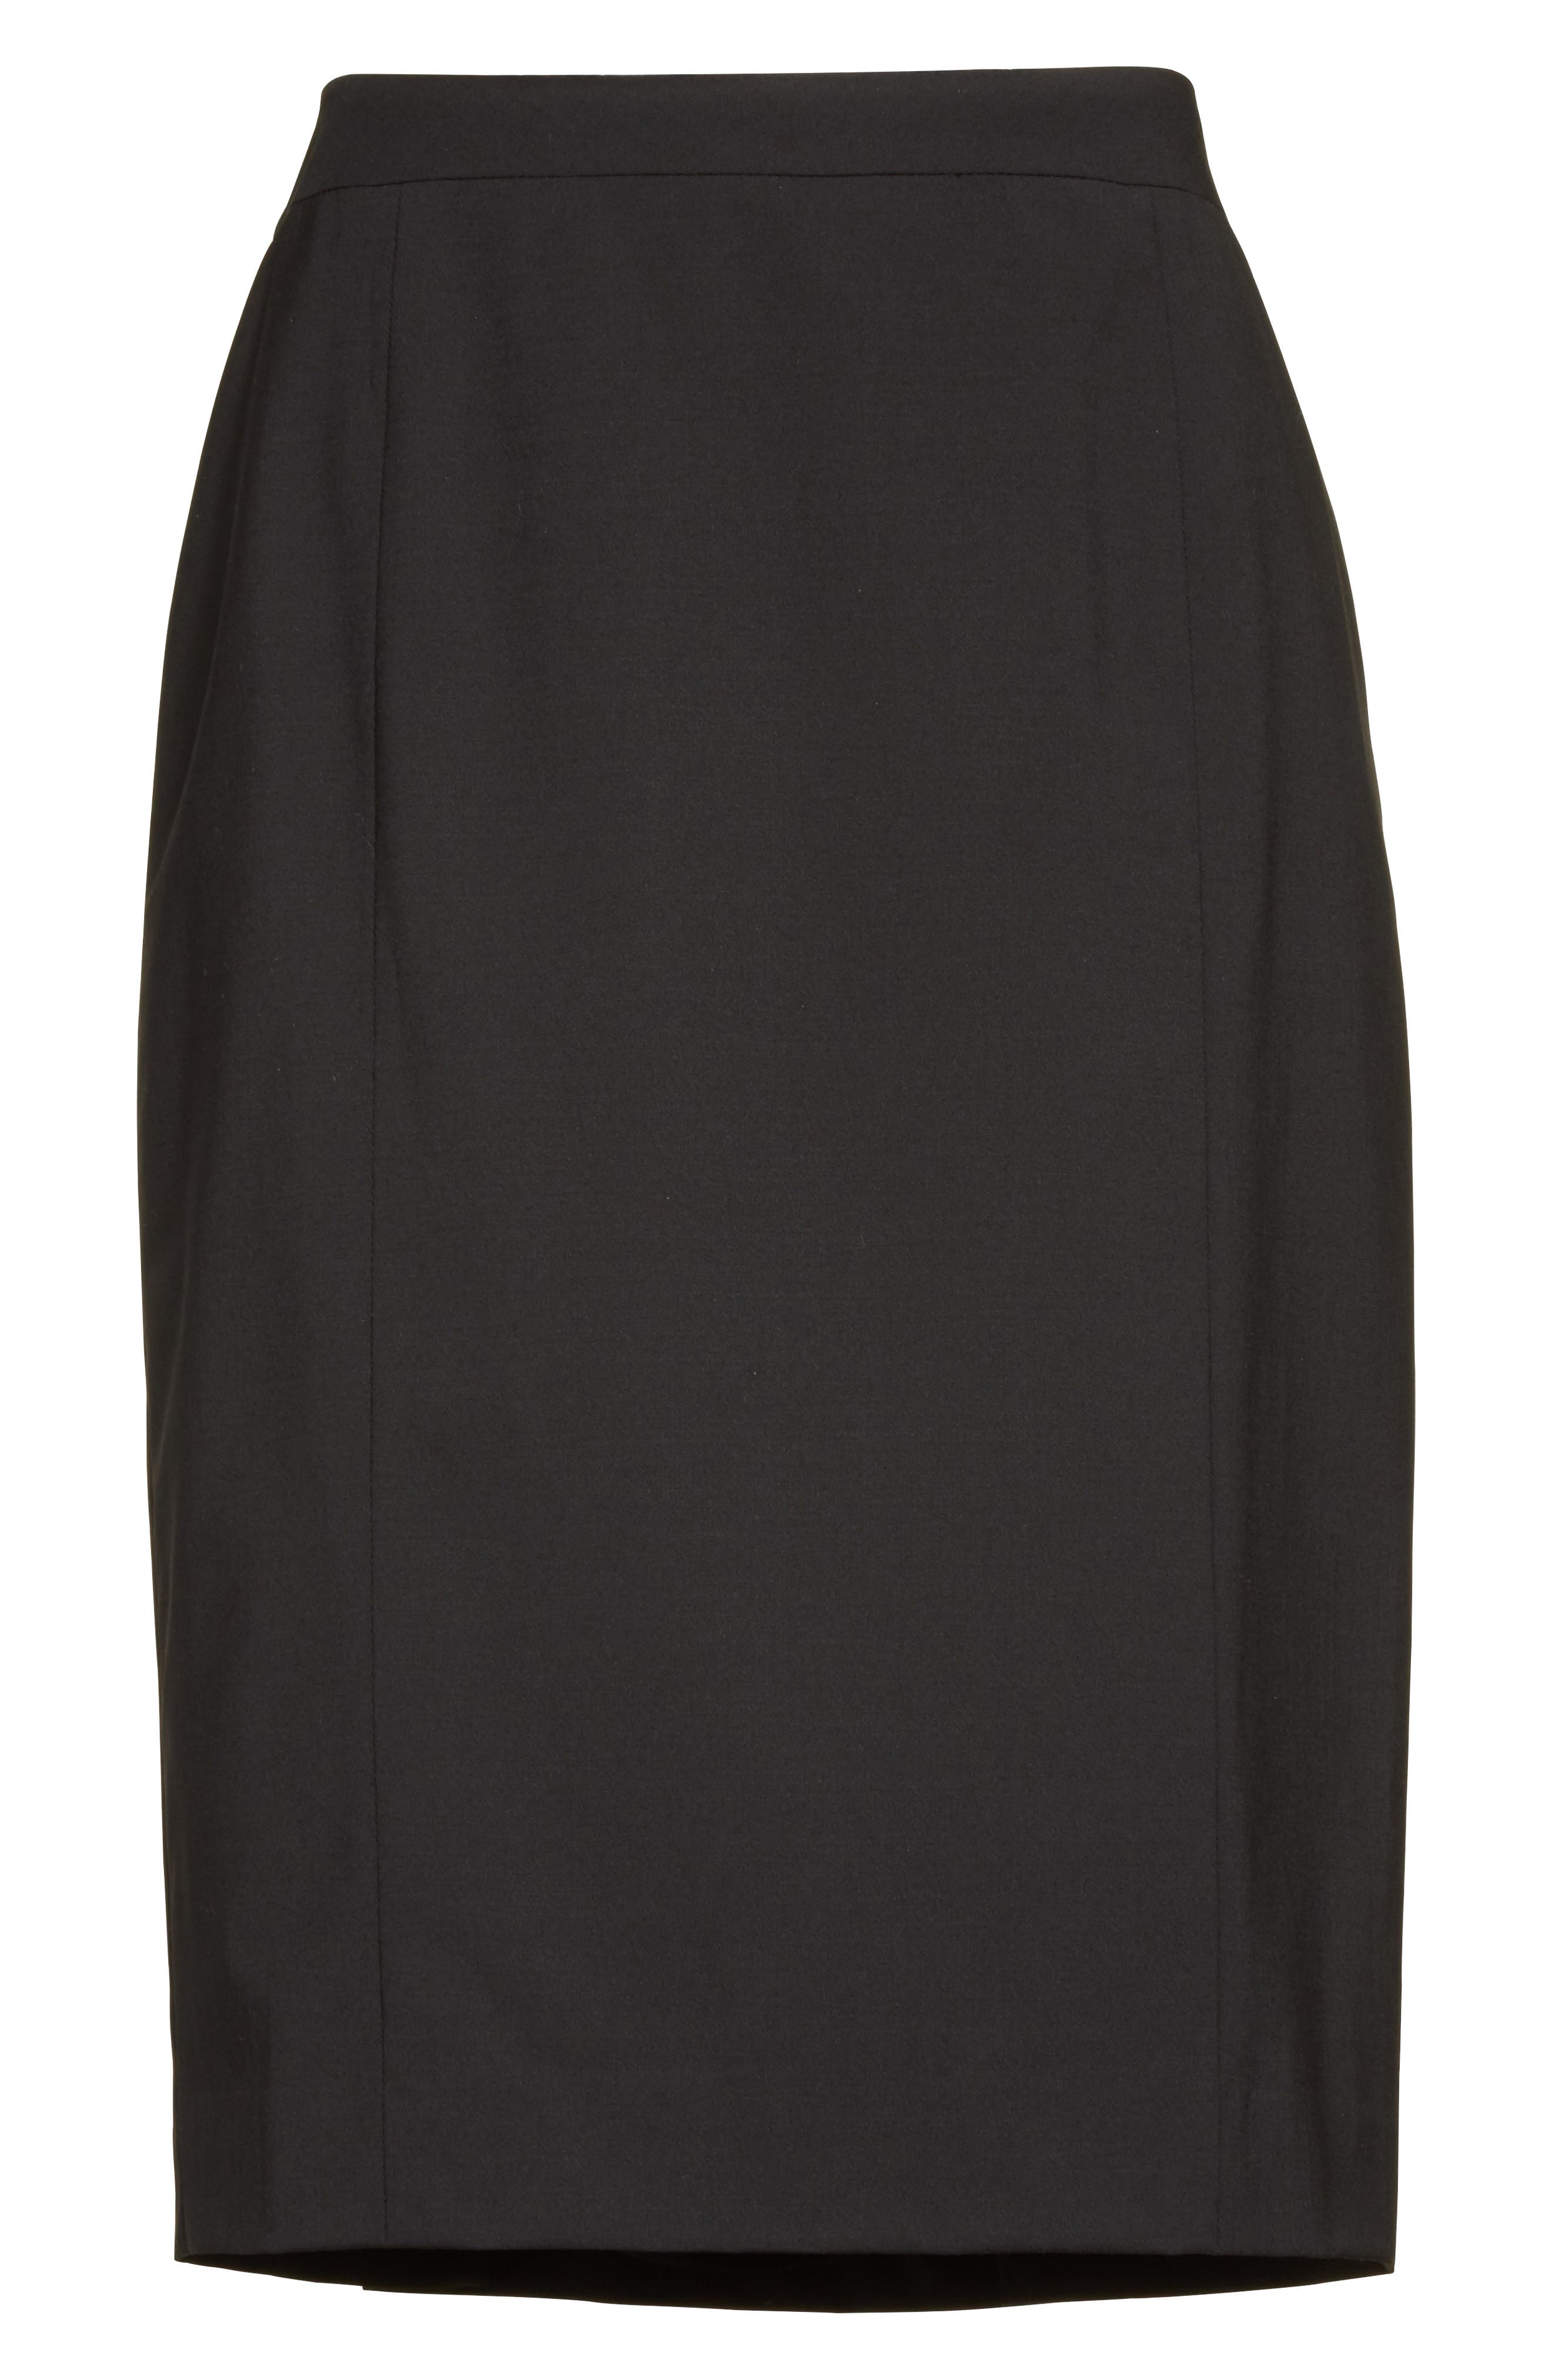 Alternate Image 4  - Lafayette 148 New York Stretch Wool Pencil Skirt